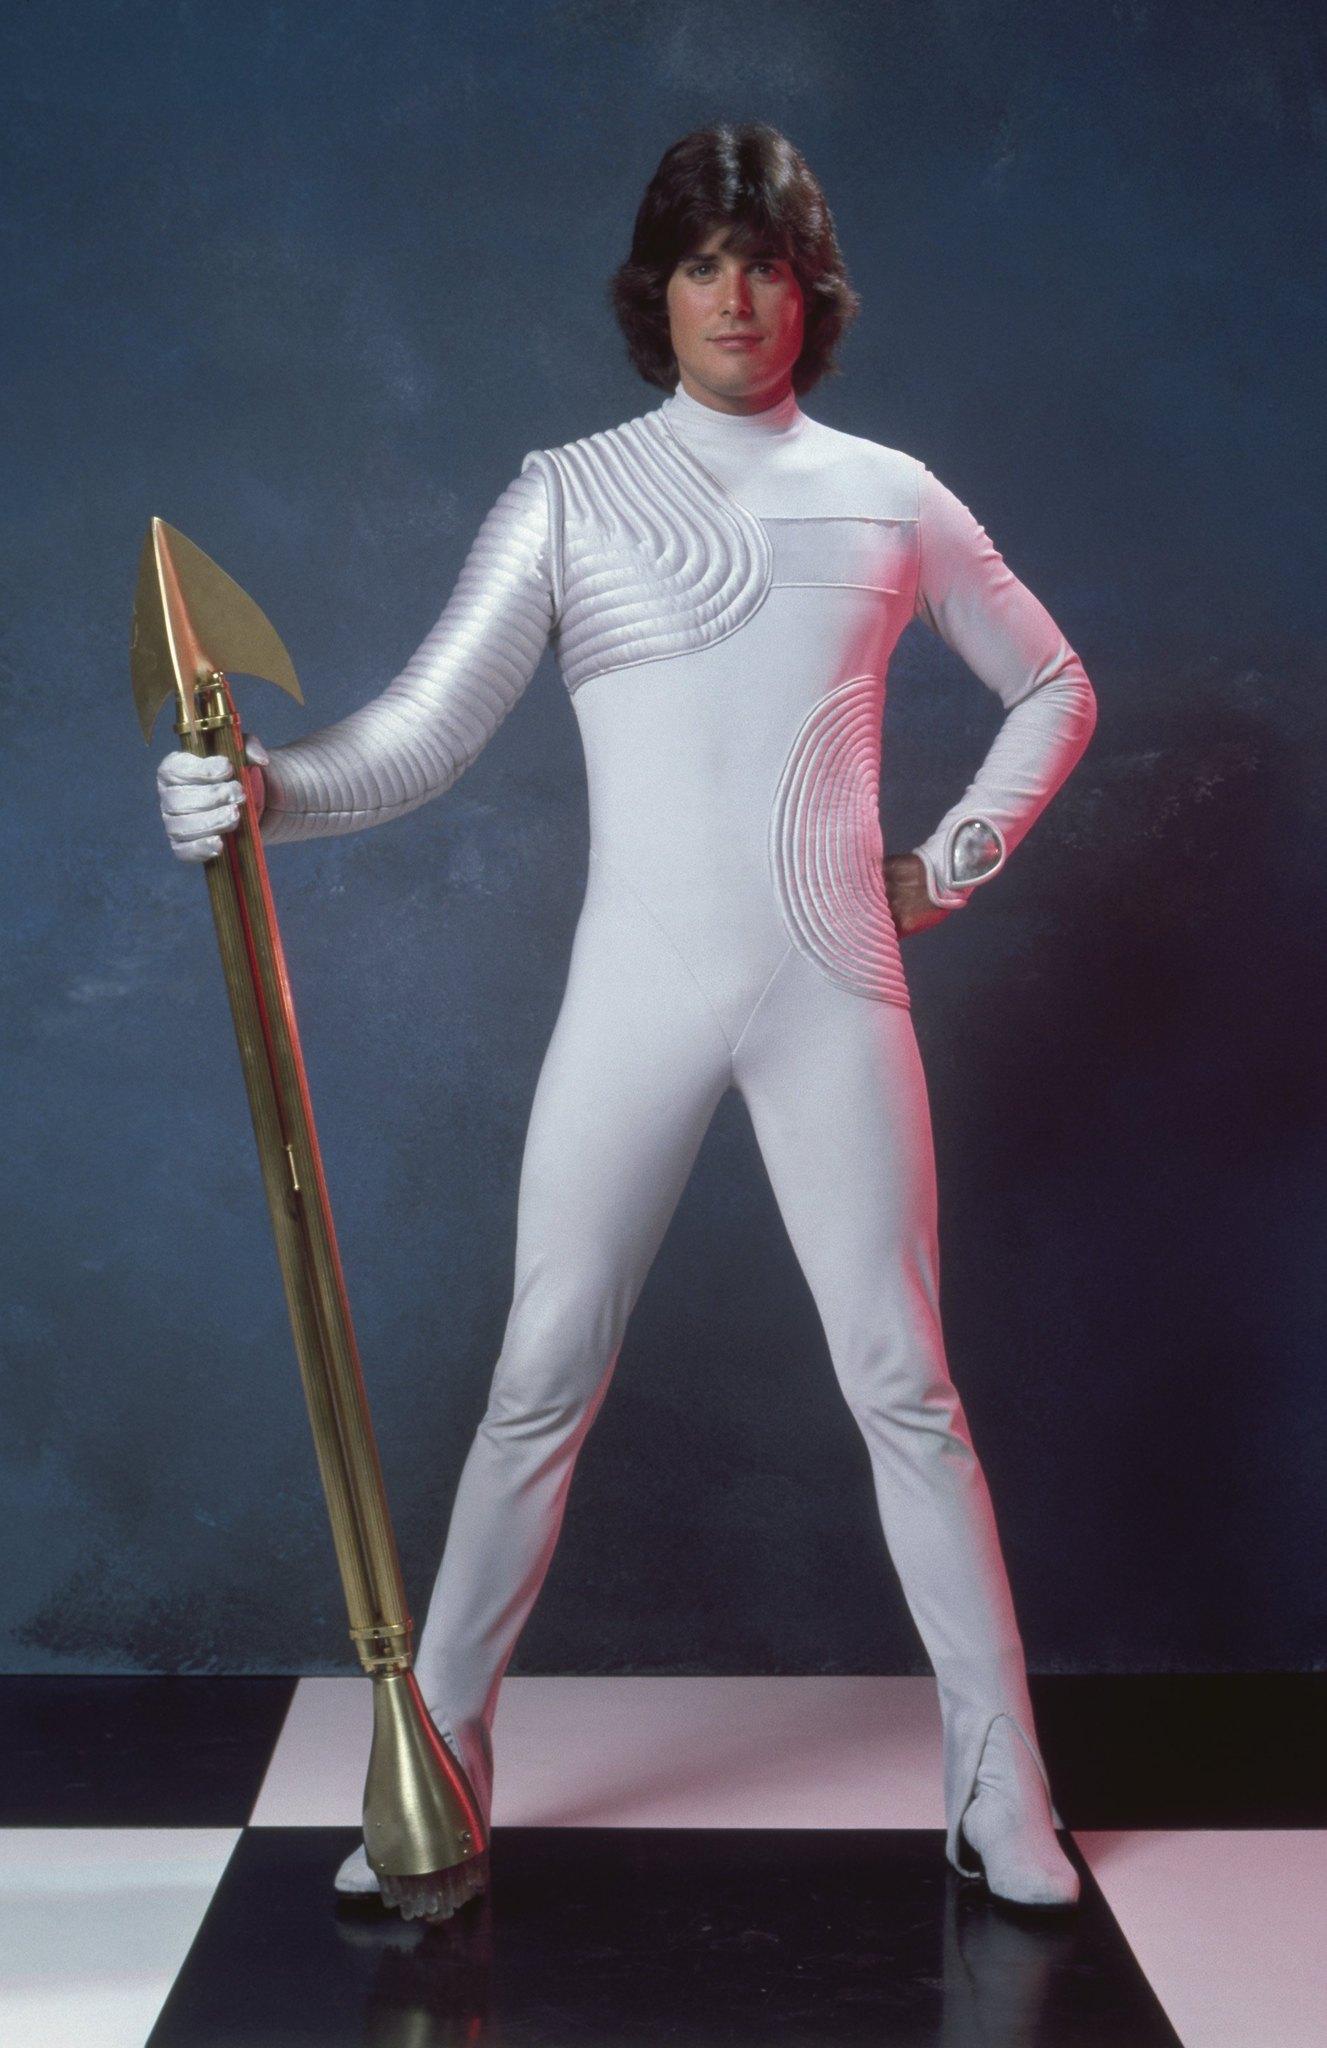 Peter Barton in The Powers of Matthew Star (1982)